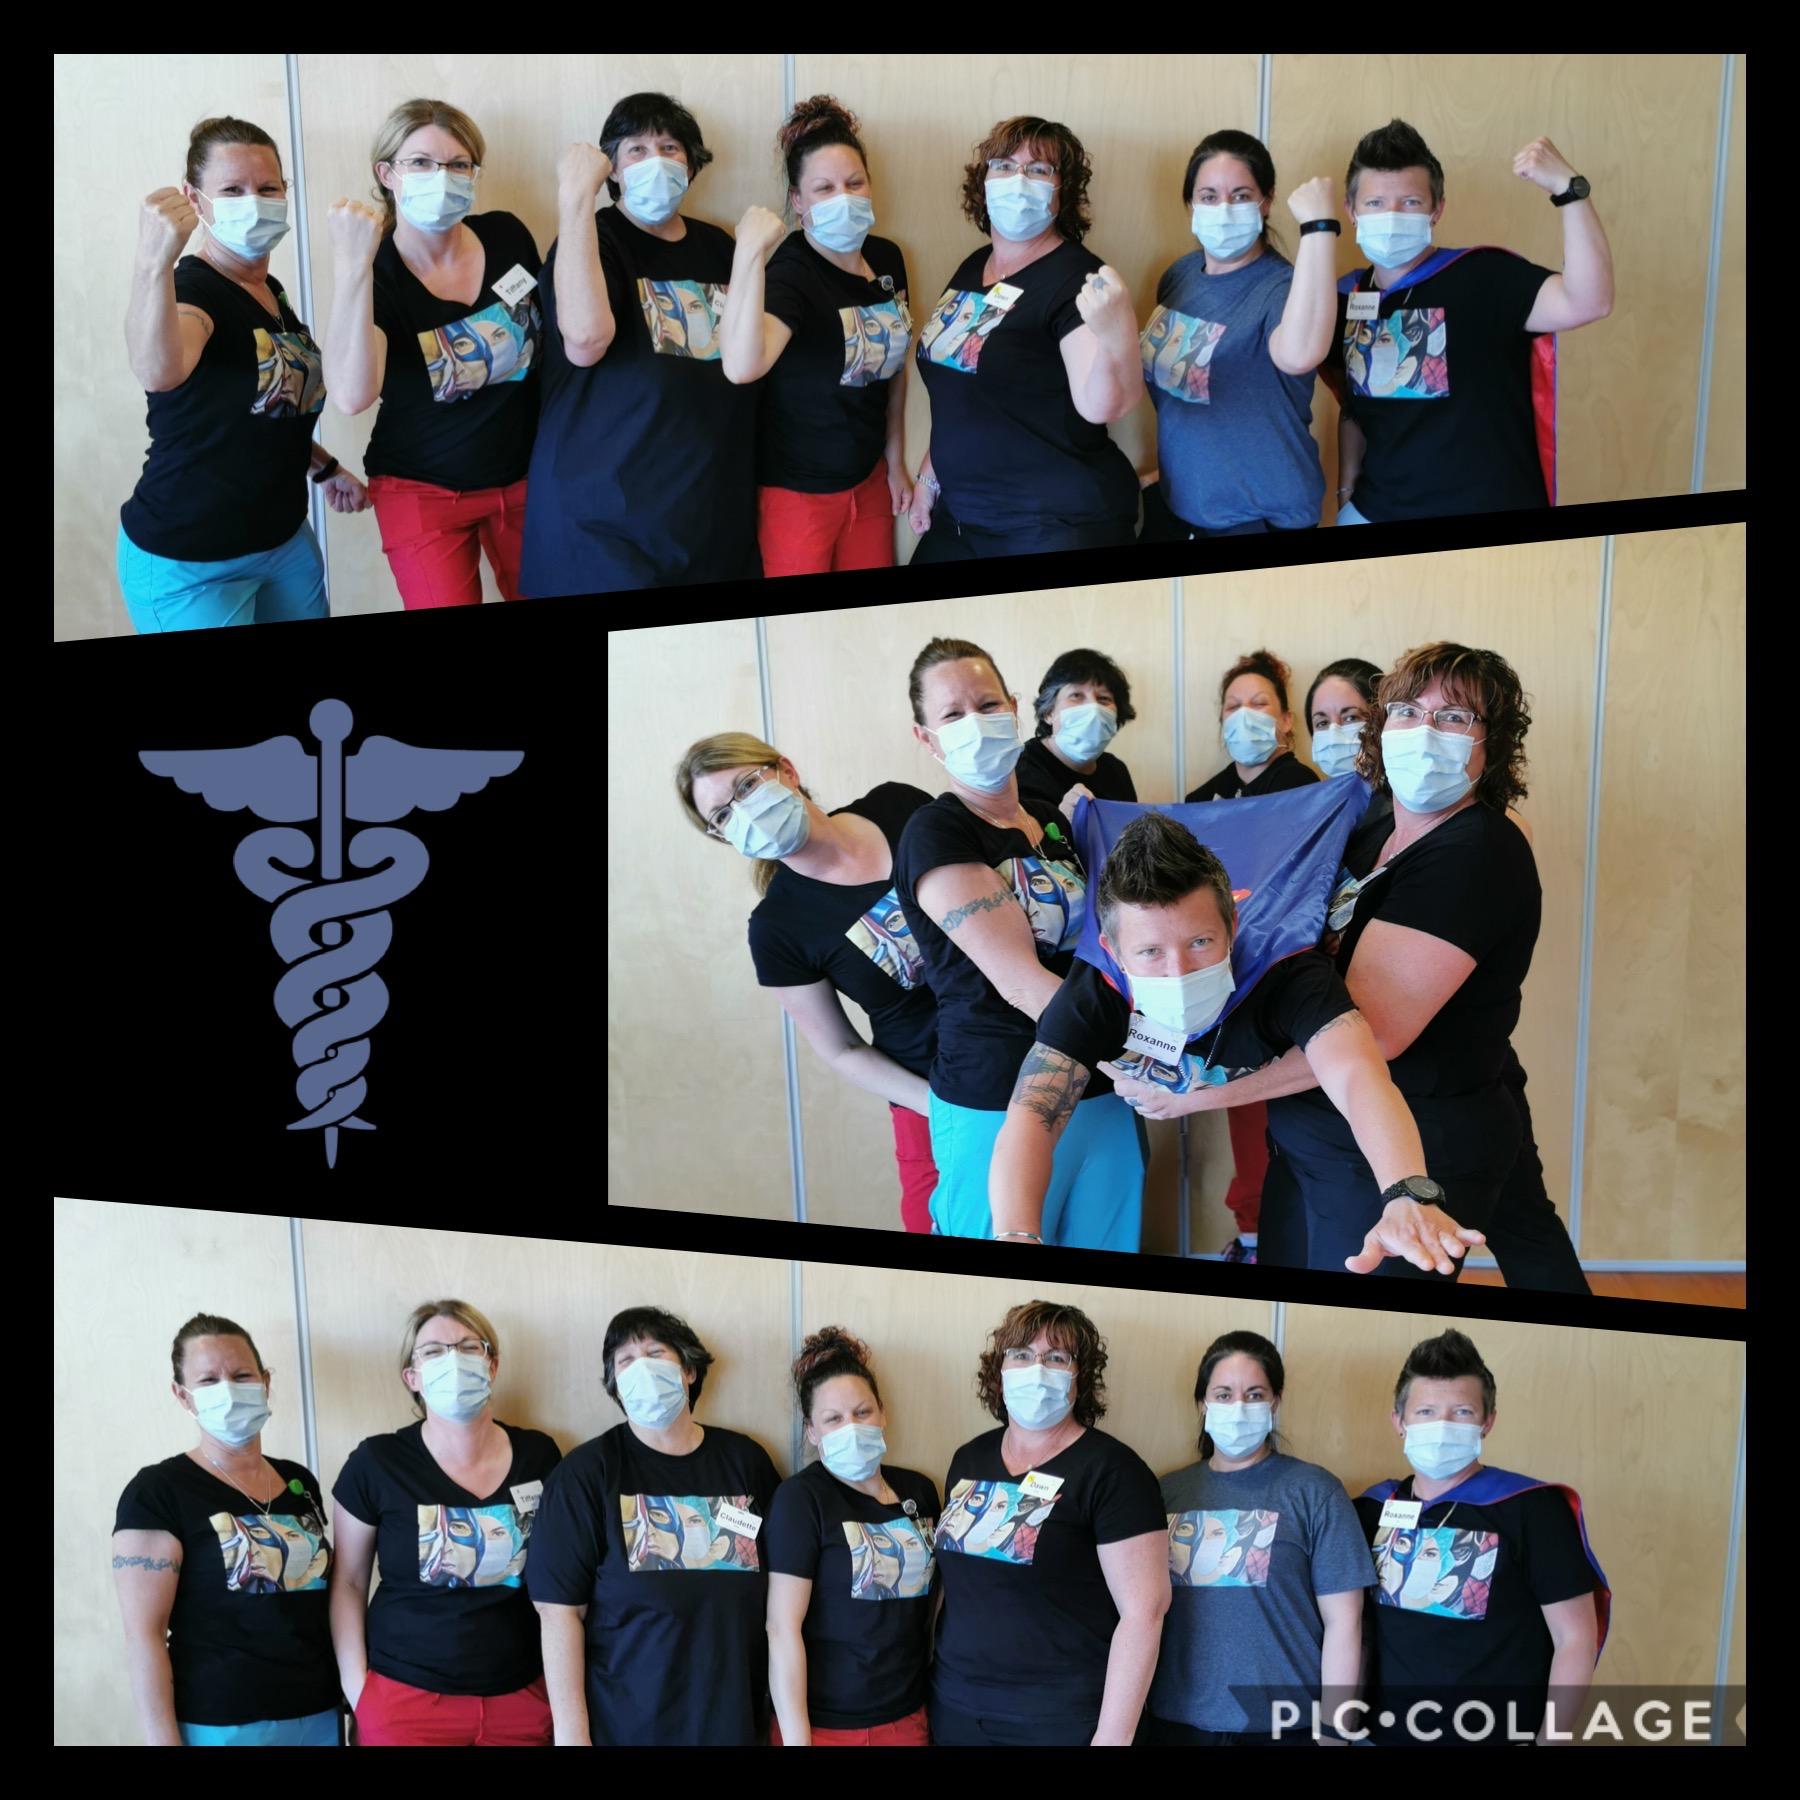 VSGV staff wearing face masks and superhero capes